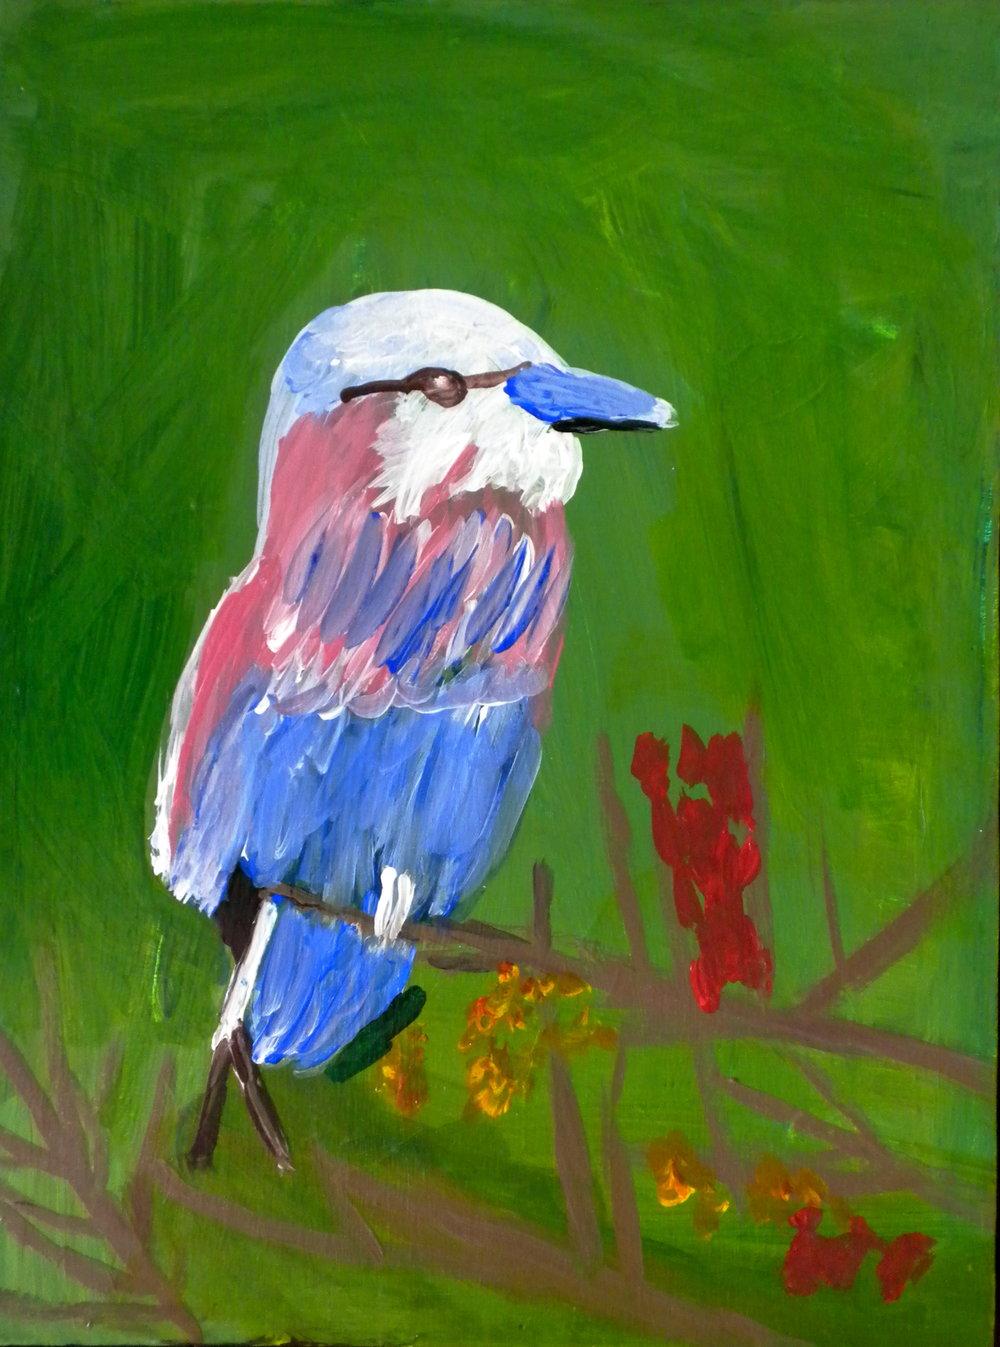 A Colorful Bird, Karen C.jpg